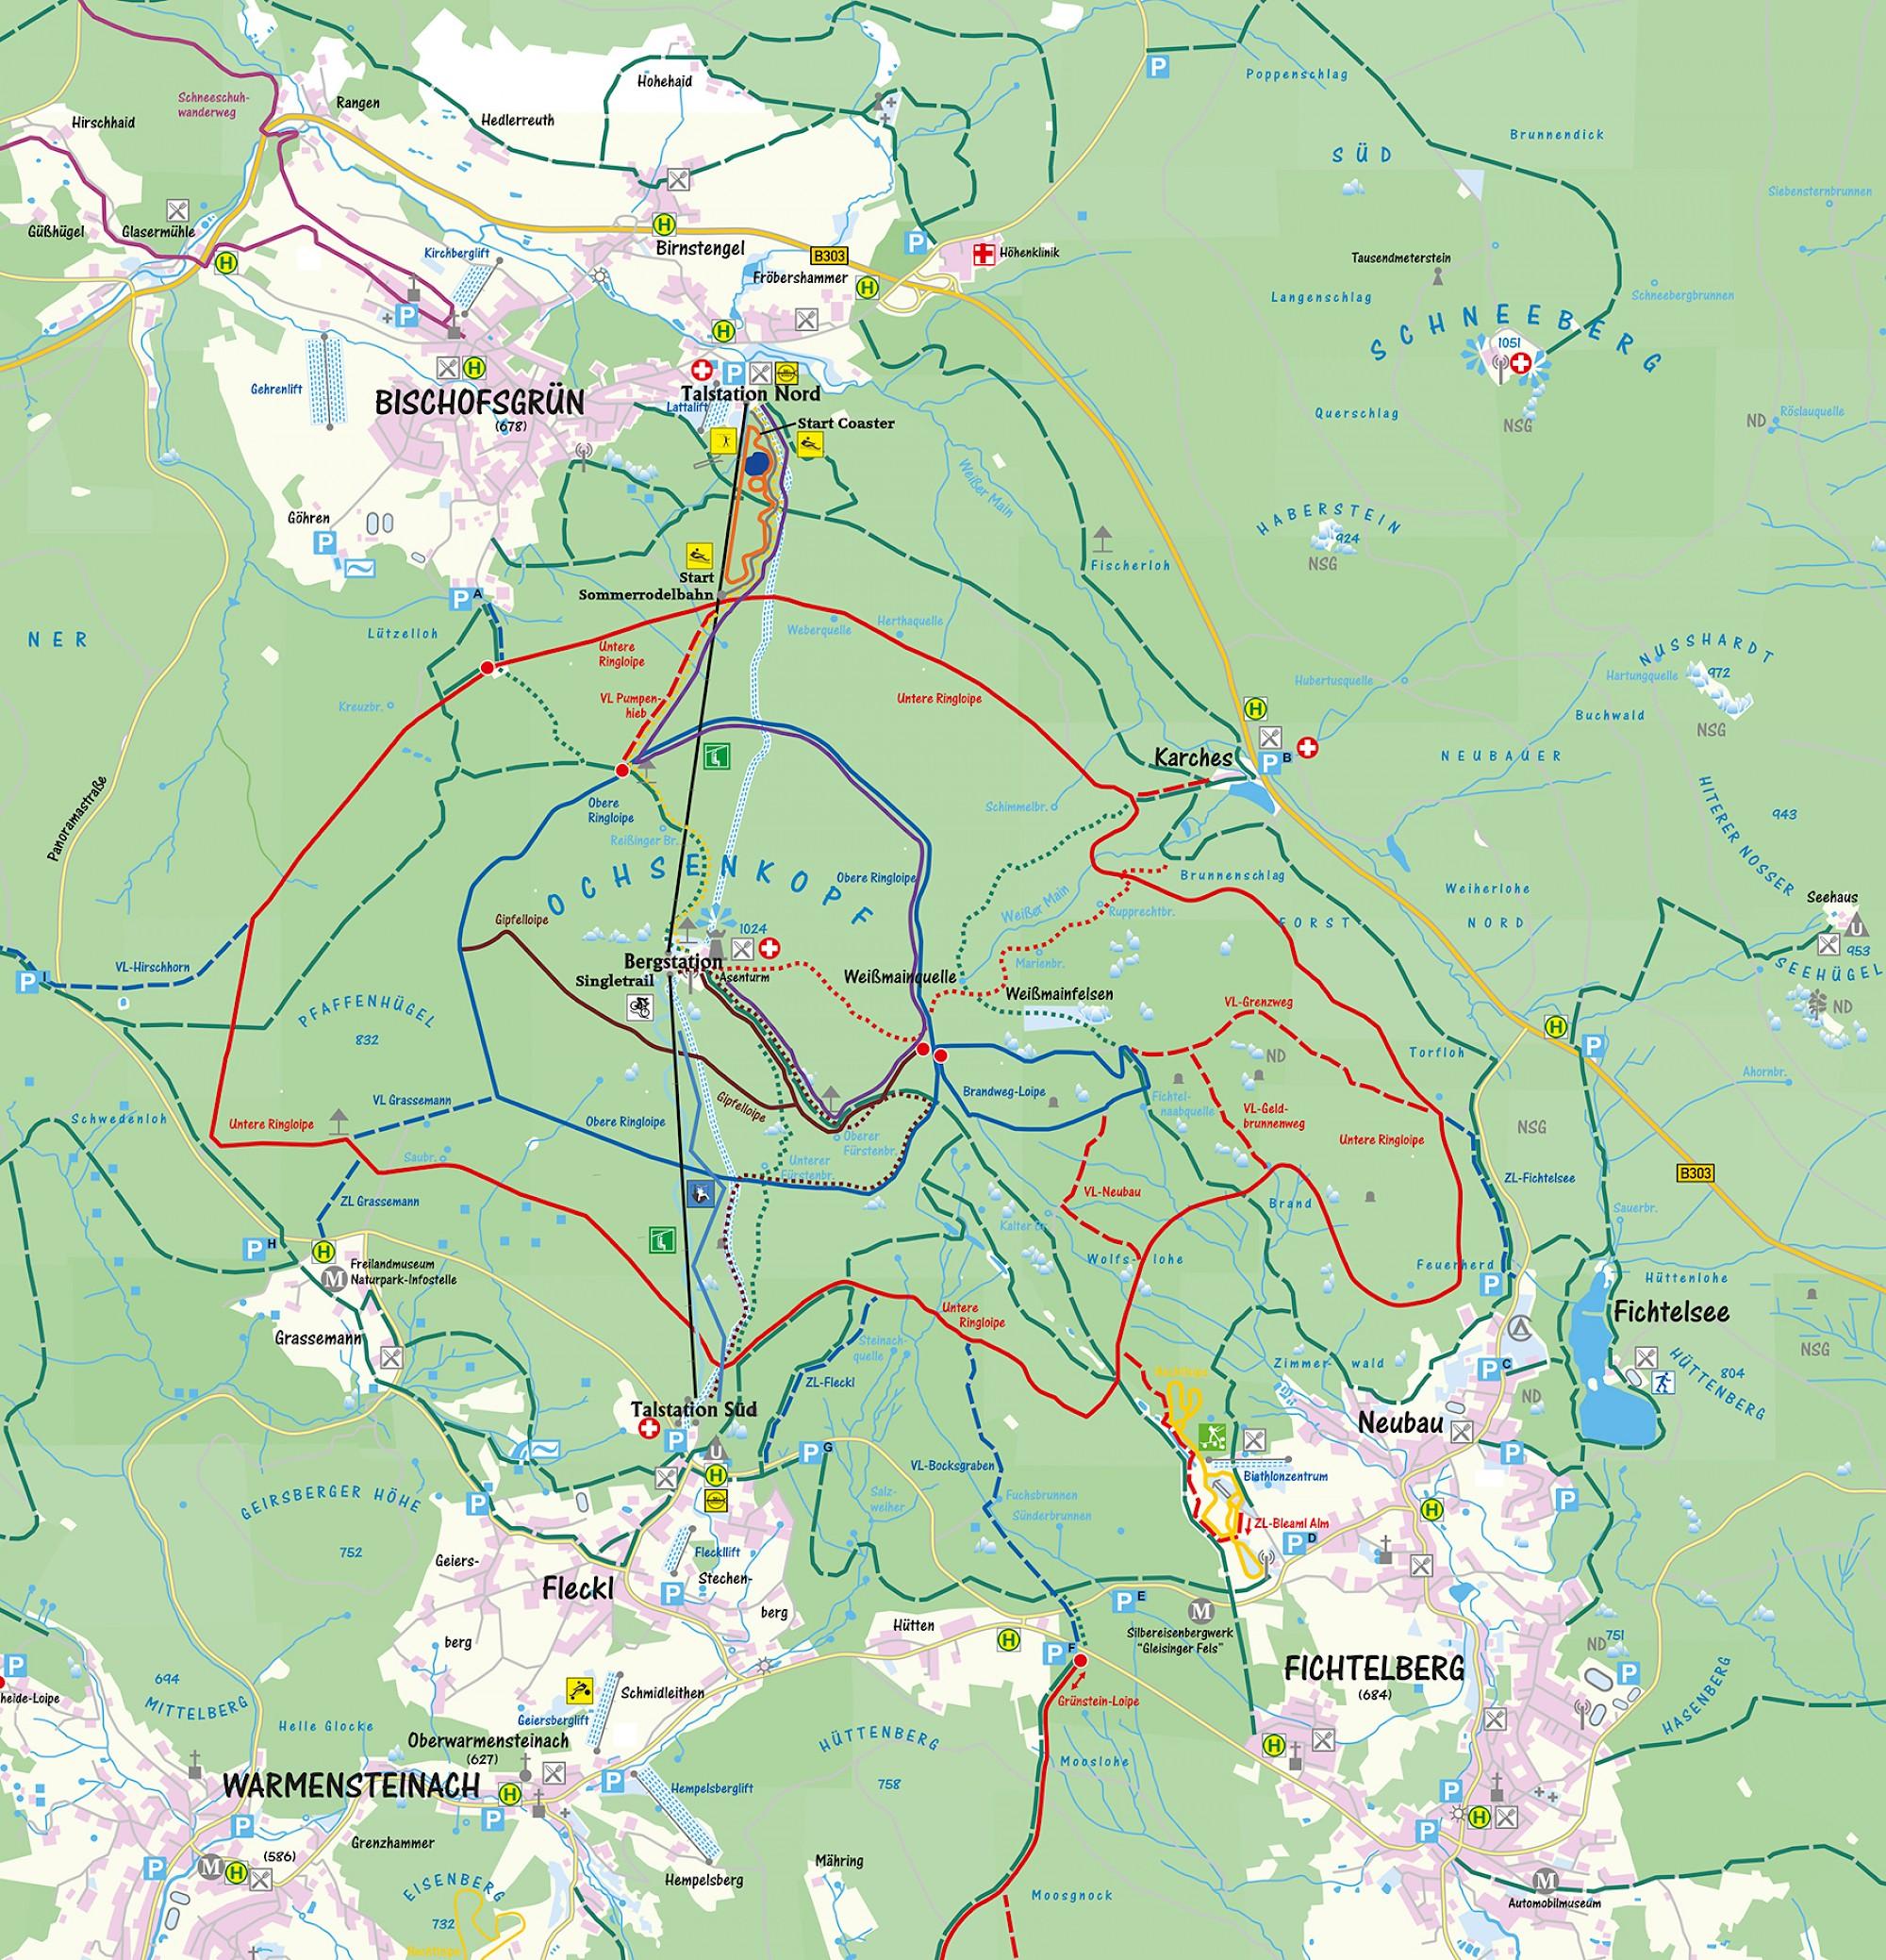 Seilbahnen Ochsenkopf - Sommer - Wanderwege - Klettern, Biken ...